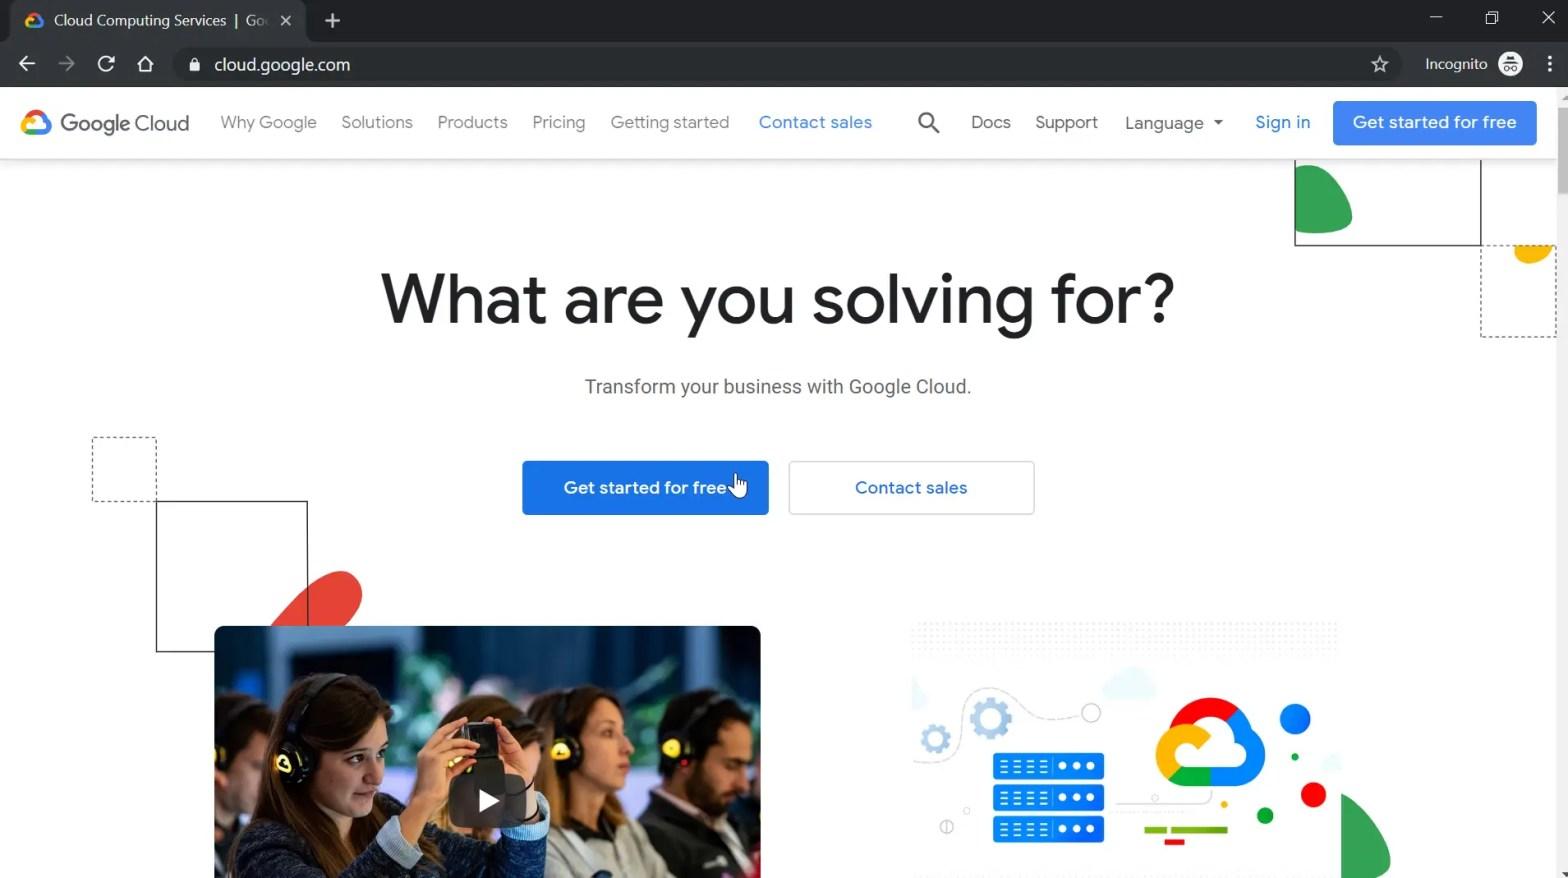 How to create a Google Cloud account?